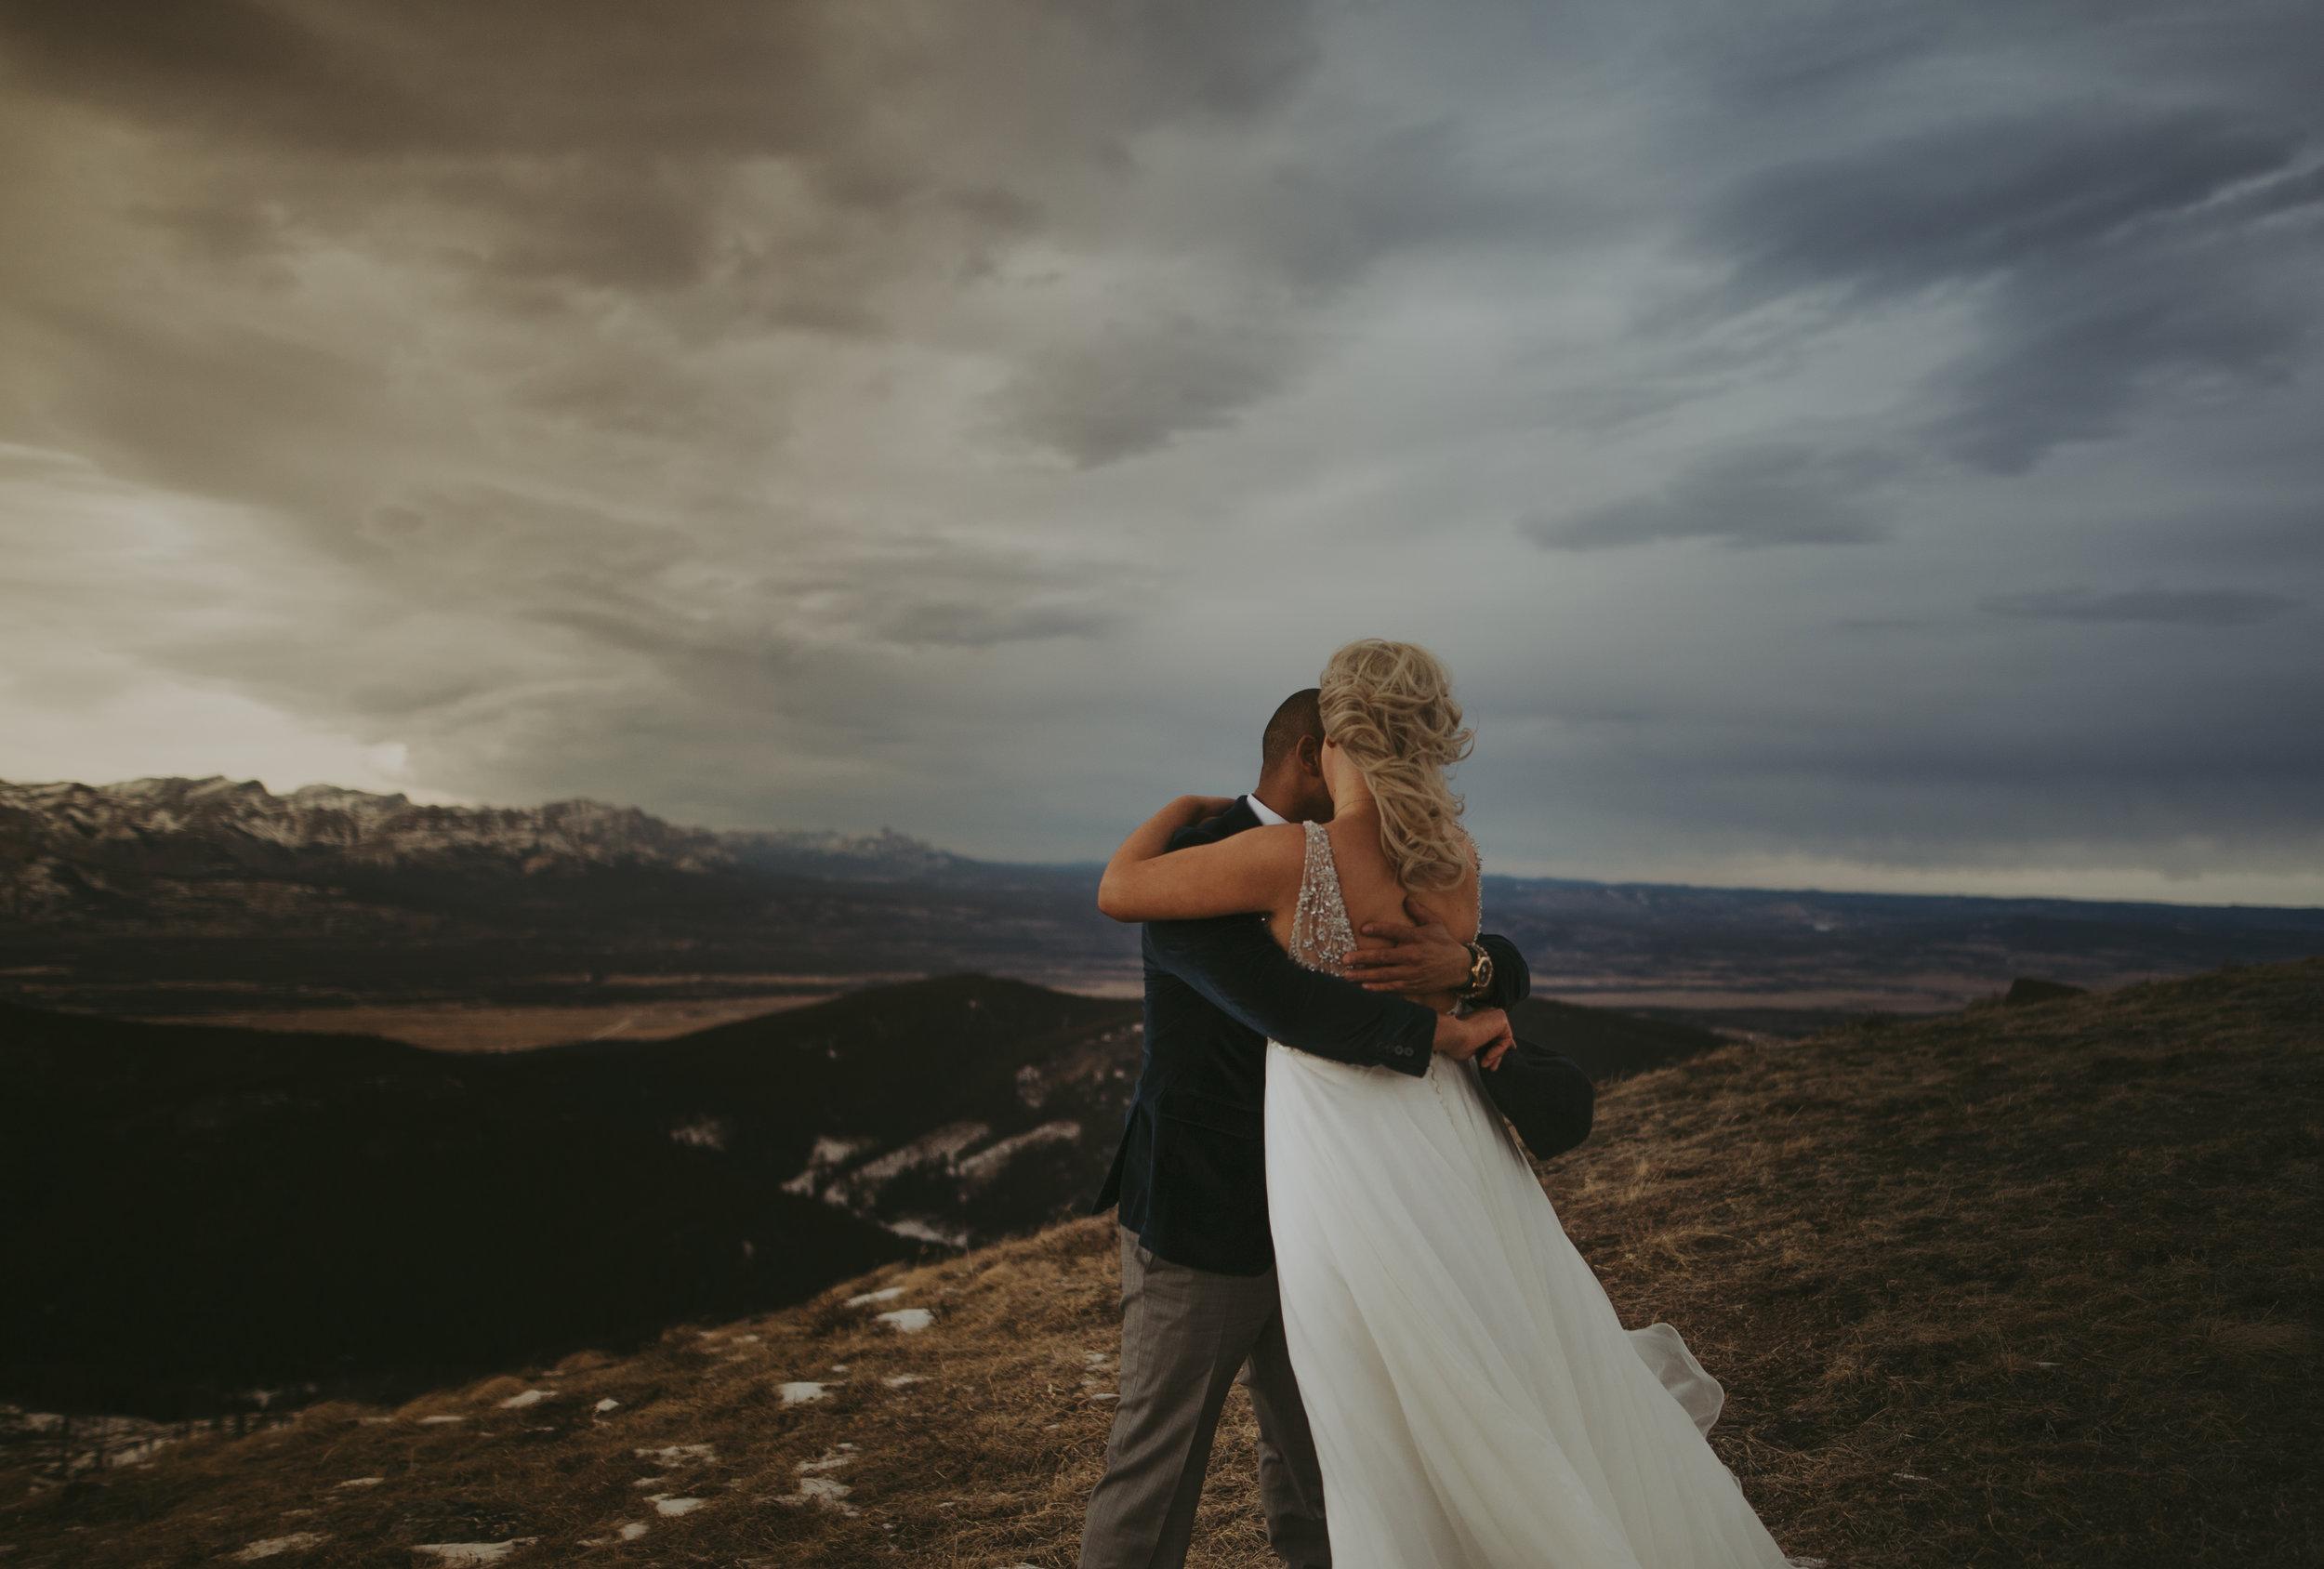 Helicopter Wedding, Banff Heli Wedding Photographers, Destination Wedding Photography, Best Destination Elopement Photographers, Adventure Elopement Weddings